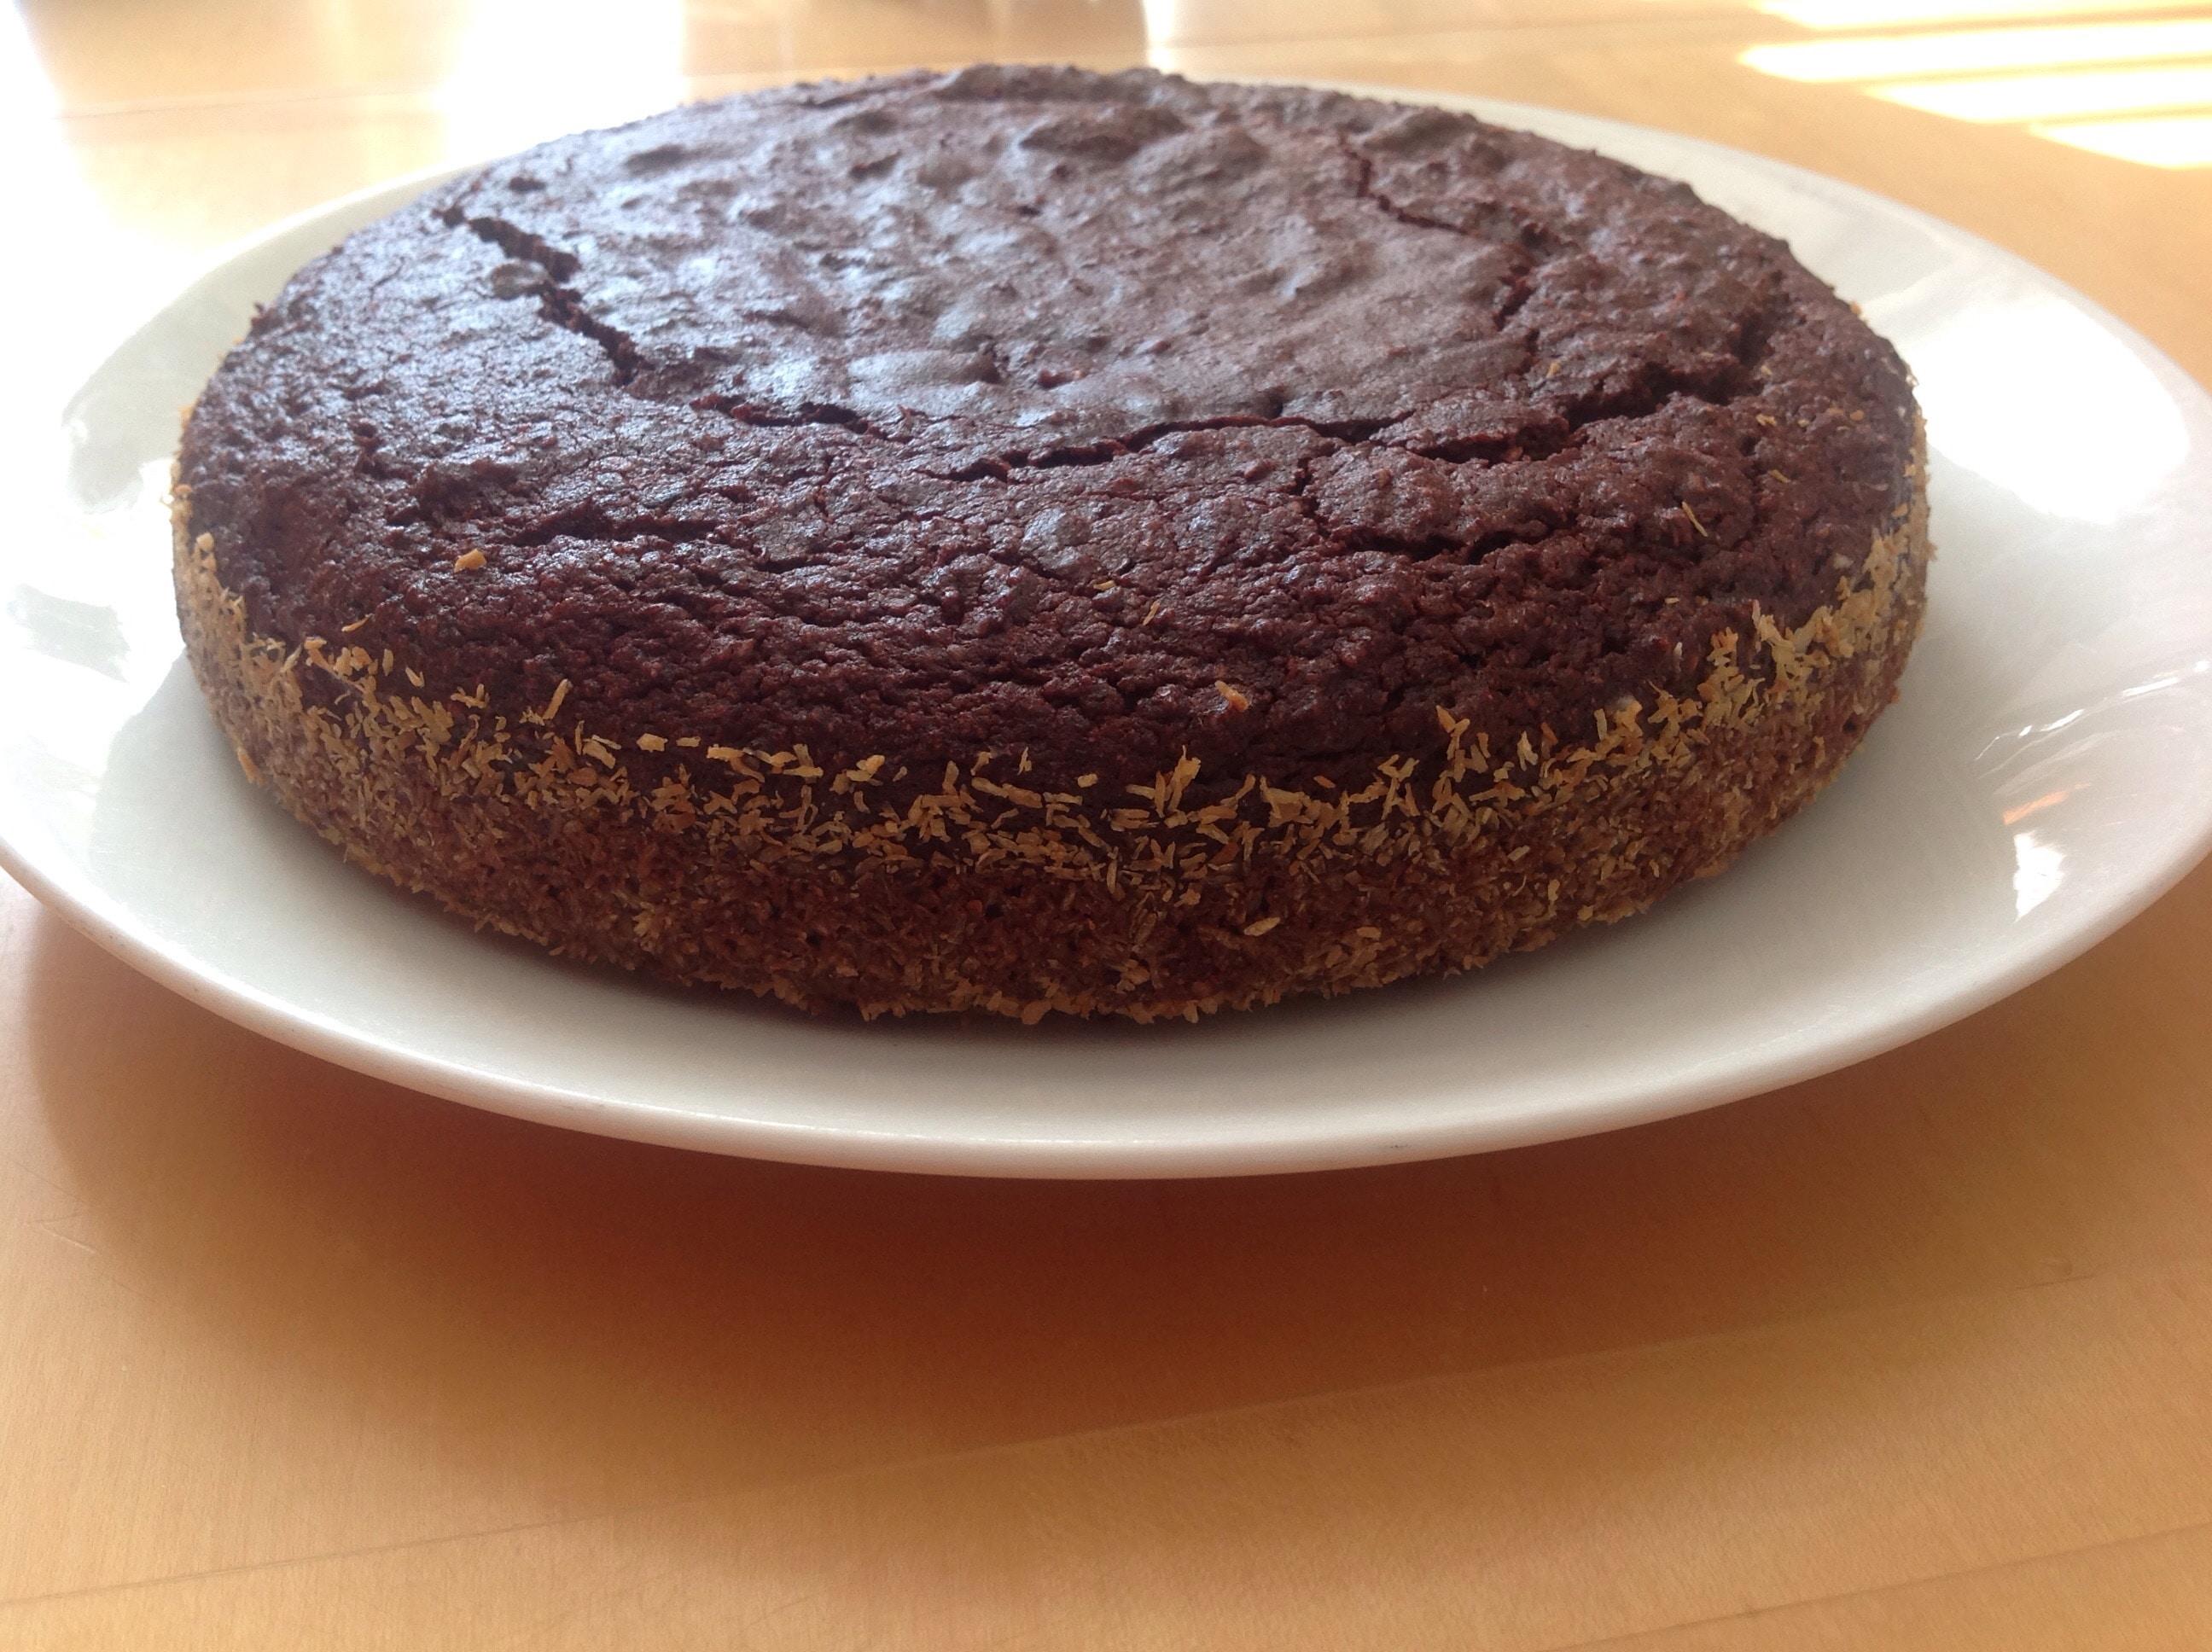 Grate Chocolate Food Processor